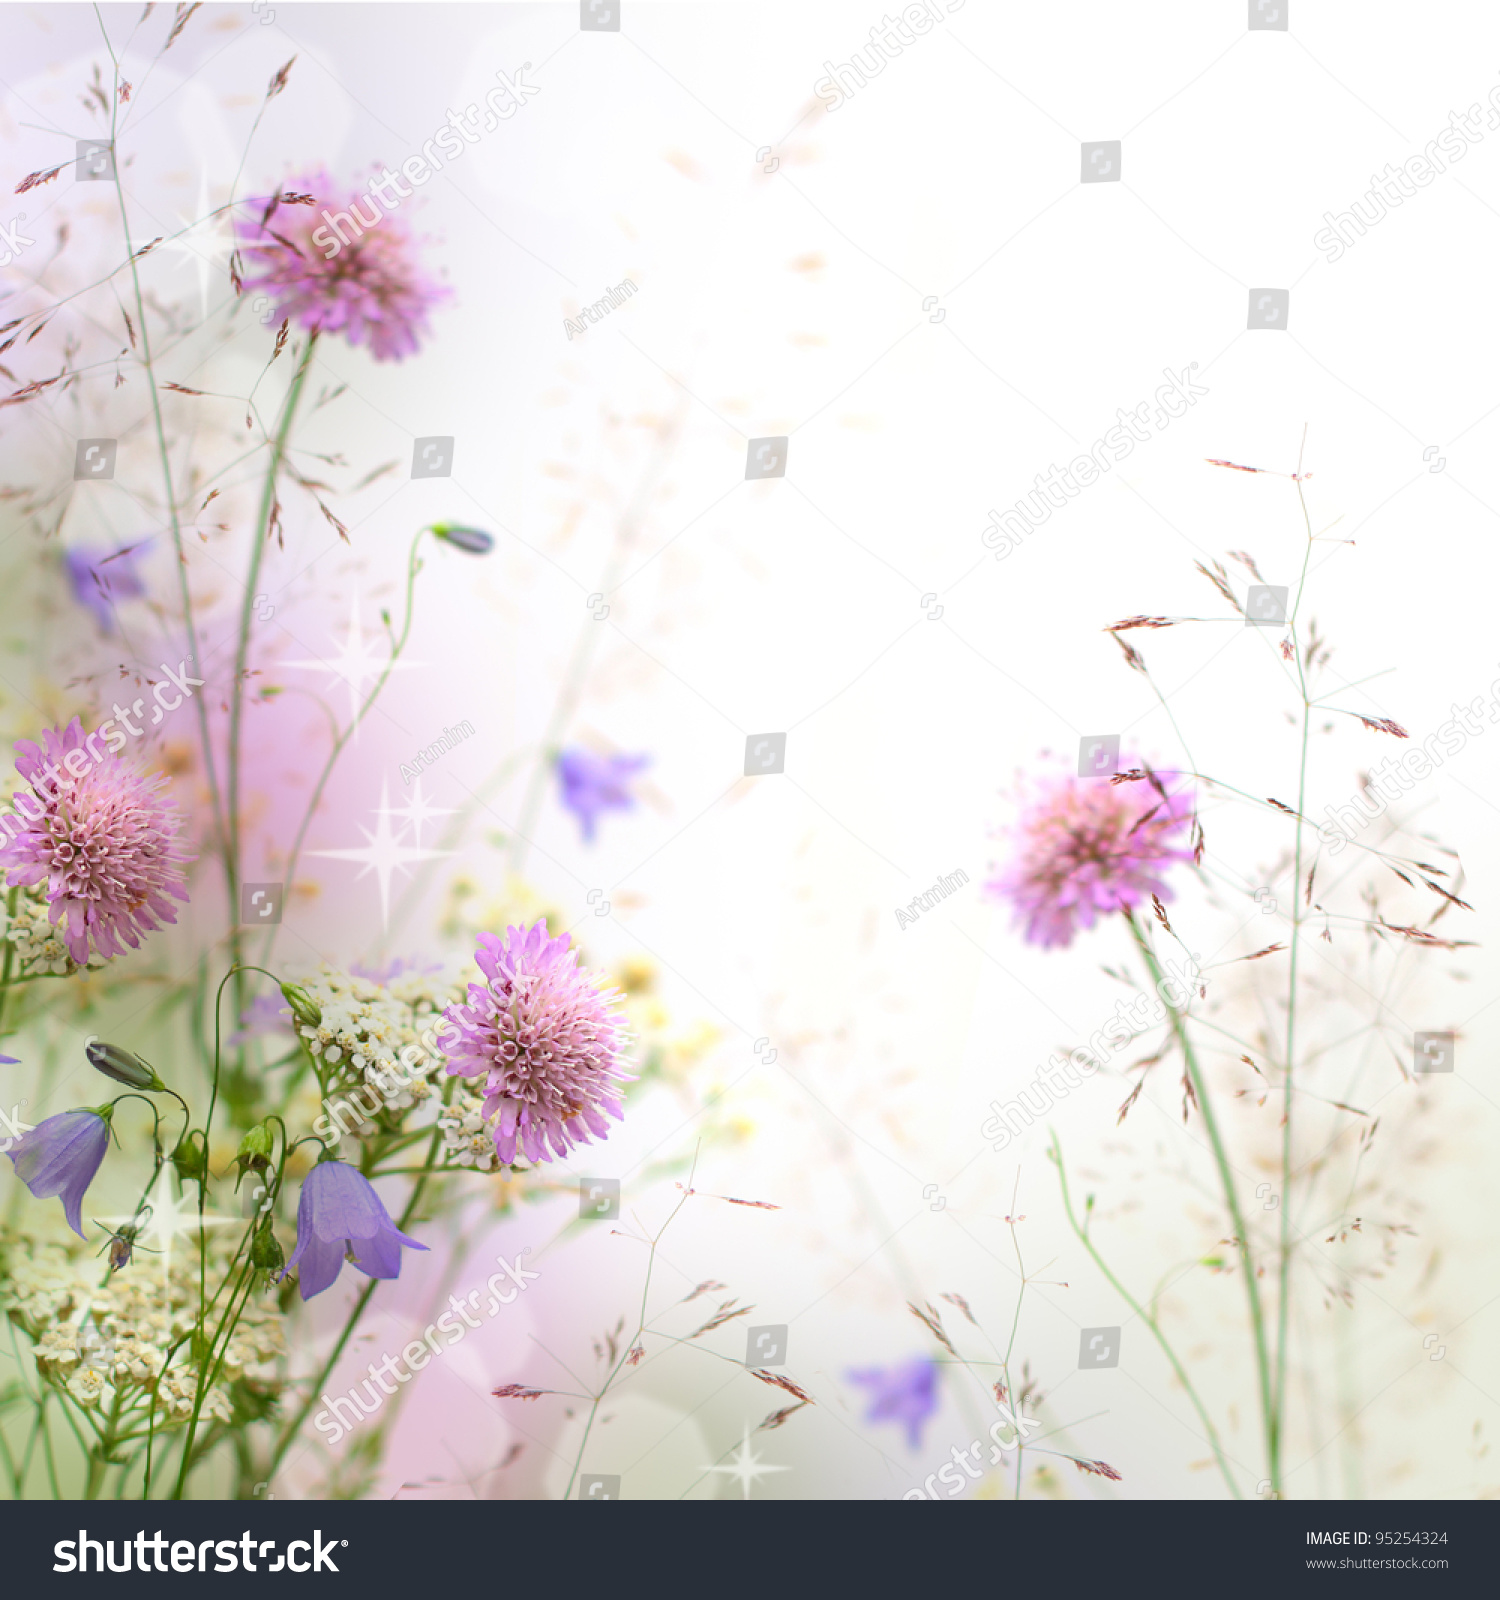 1500x1600px beautiful floral backgrounds - wallpapersafari